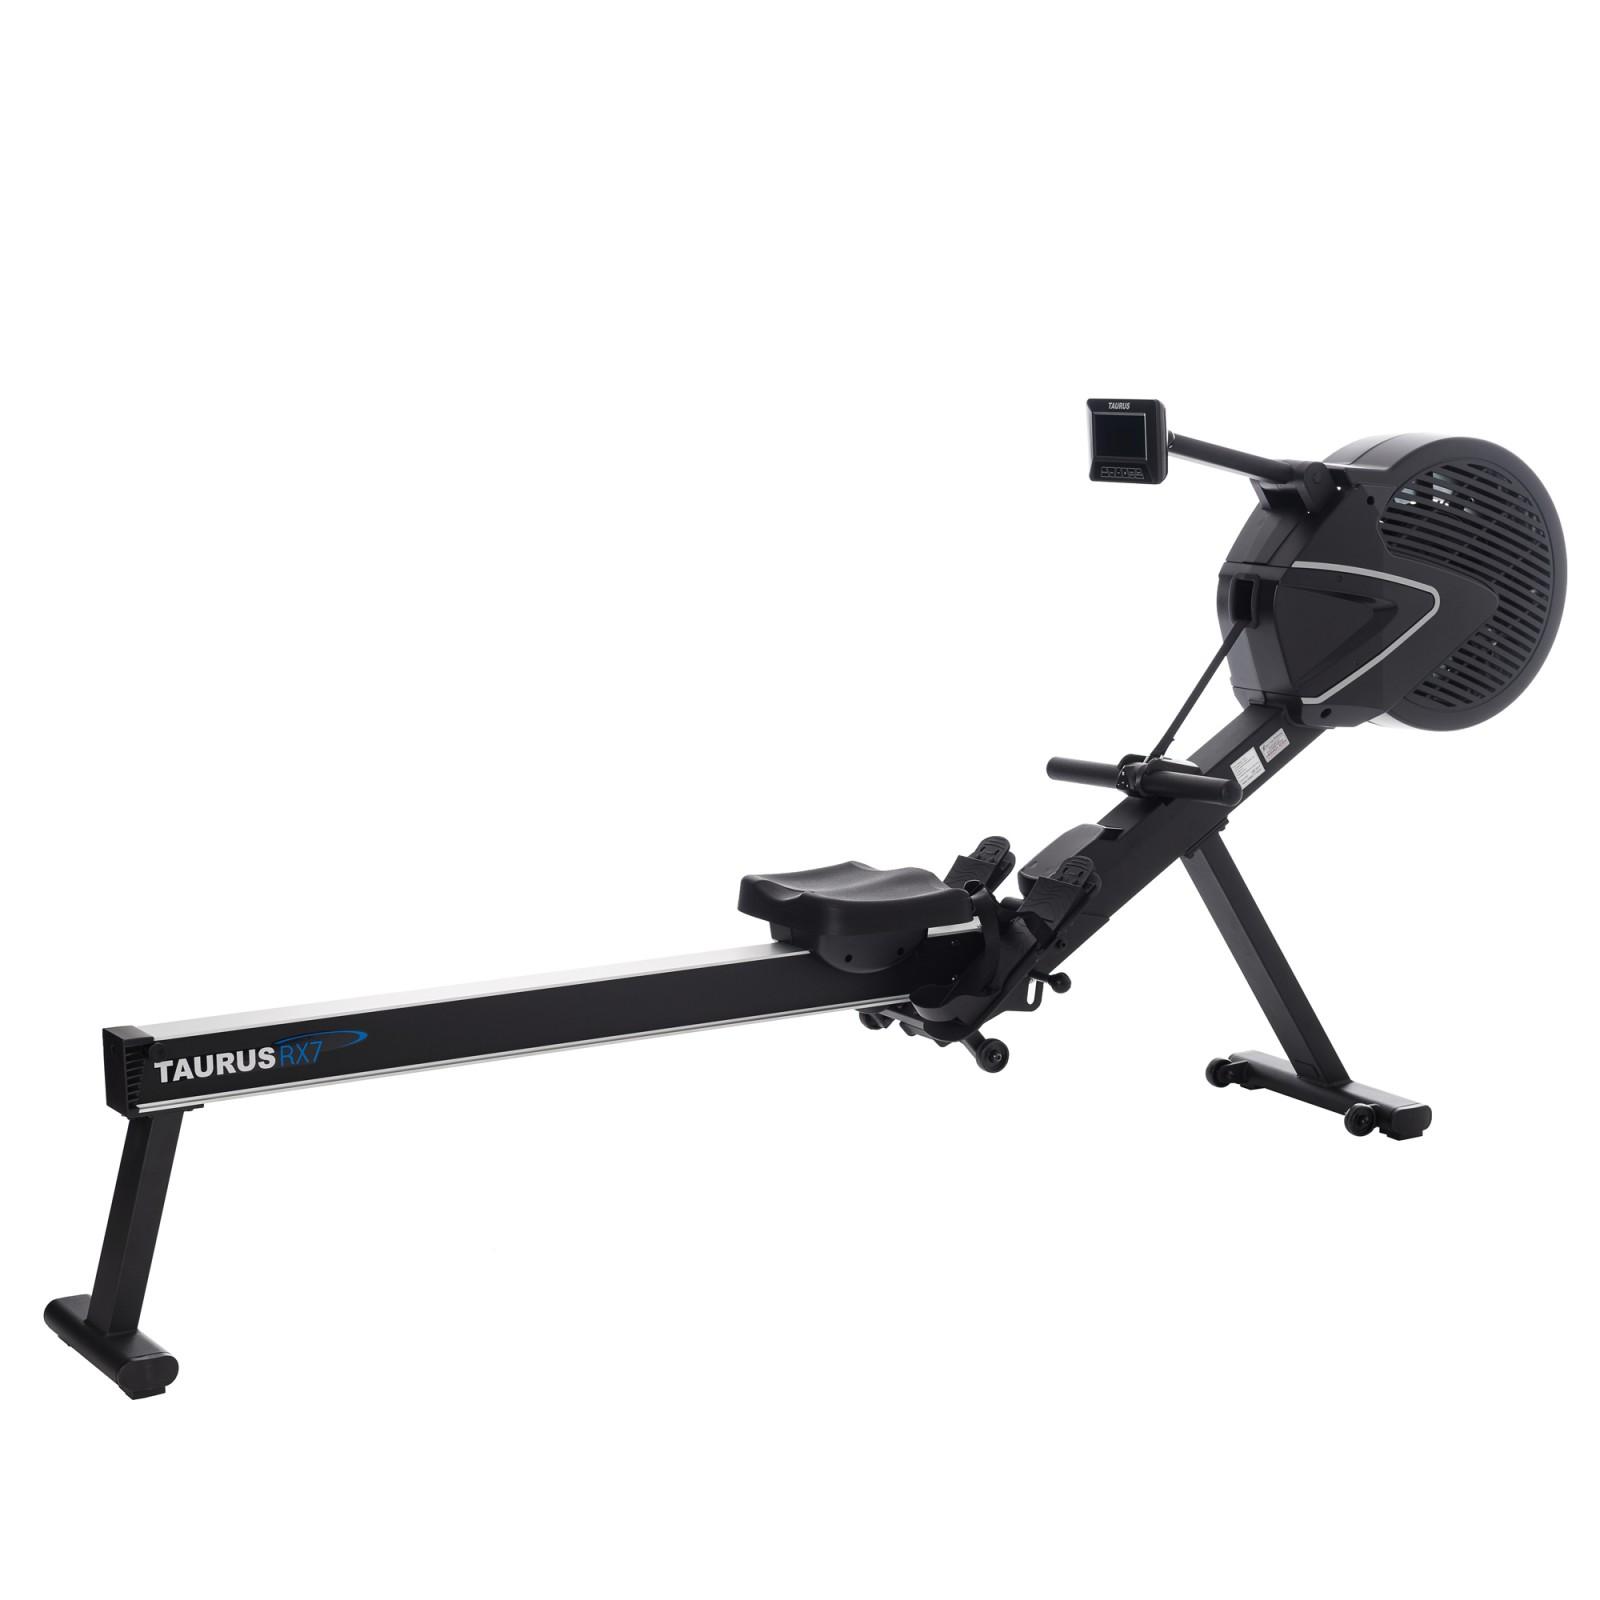 Taurus rowing machine RX7 buy with 224 customer ratings - Sport-Tiedje